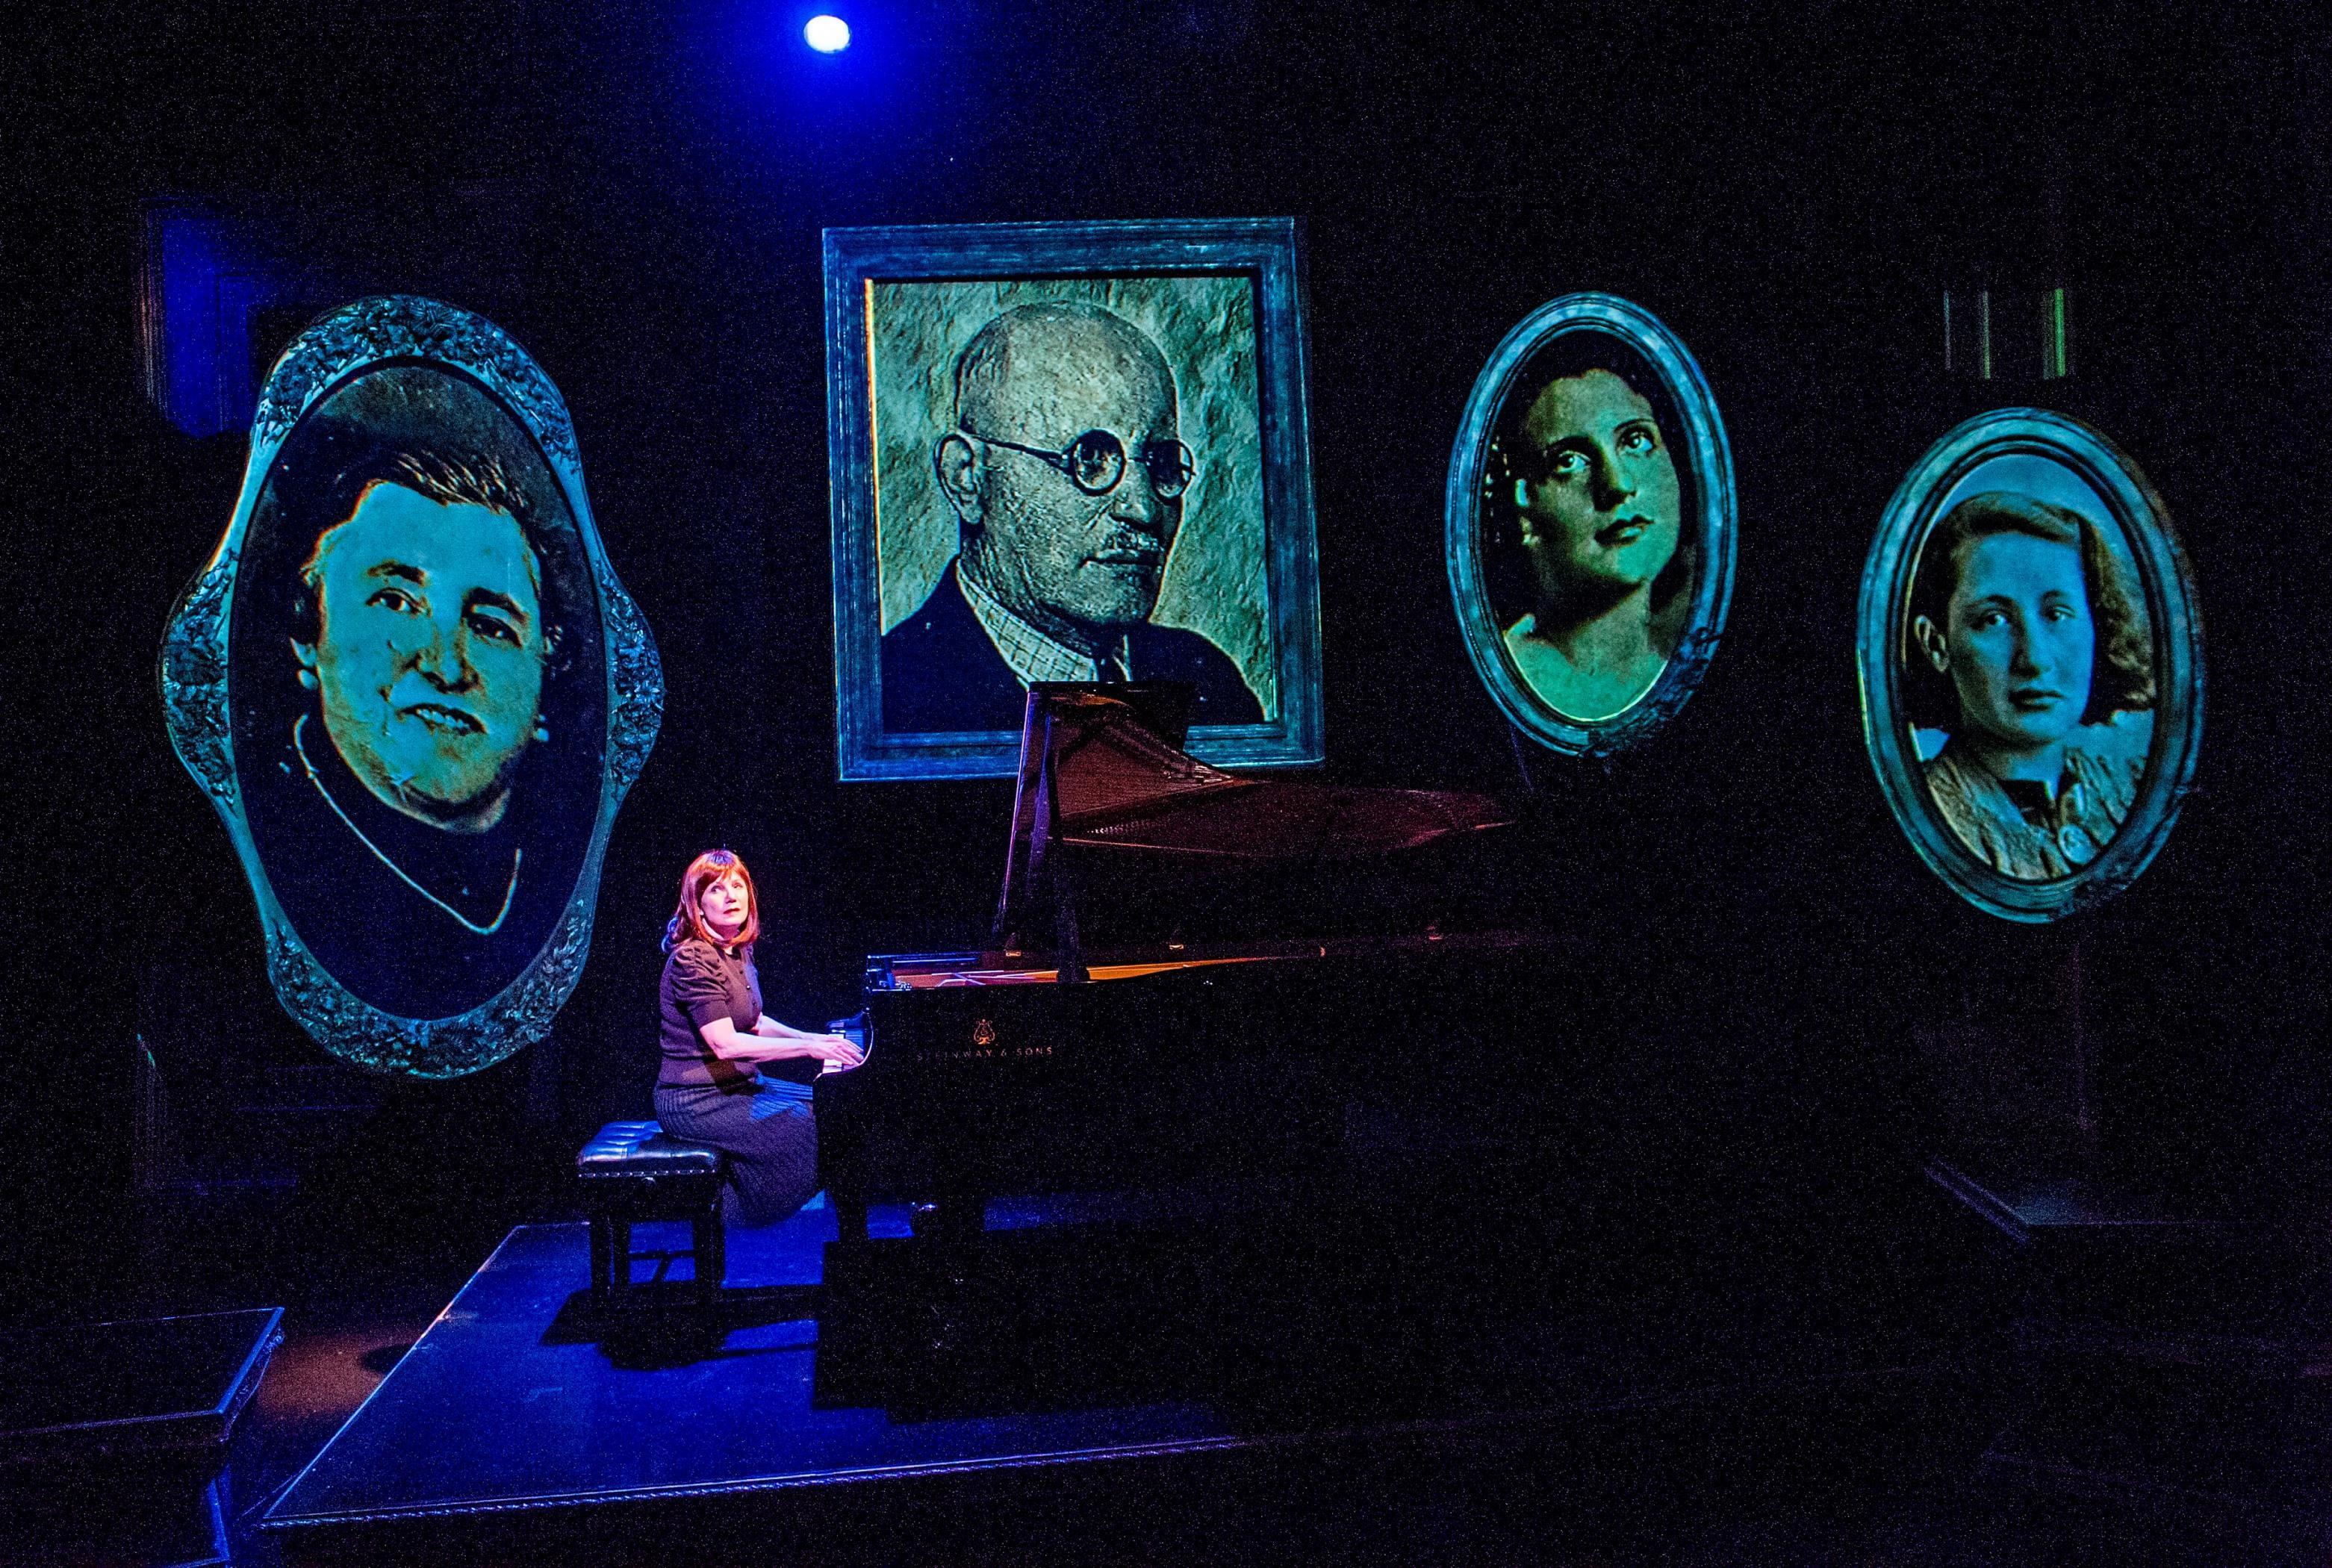 Mona Golabek (Lisa Jura) in The Pianist Of Willesden Lane by Hershey Felder @ St James Theatre. Directed by Hershey Felder (Opening 21-01-16) ©Tristram Kenton 01/16 (3 Raveley Street, LONDON NW5 2HX TEL 0207 267 5550 Mob 07973 617 355)email: tristram@tristramkenton.com